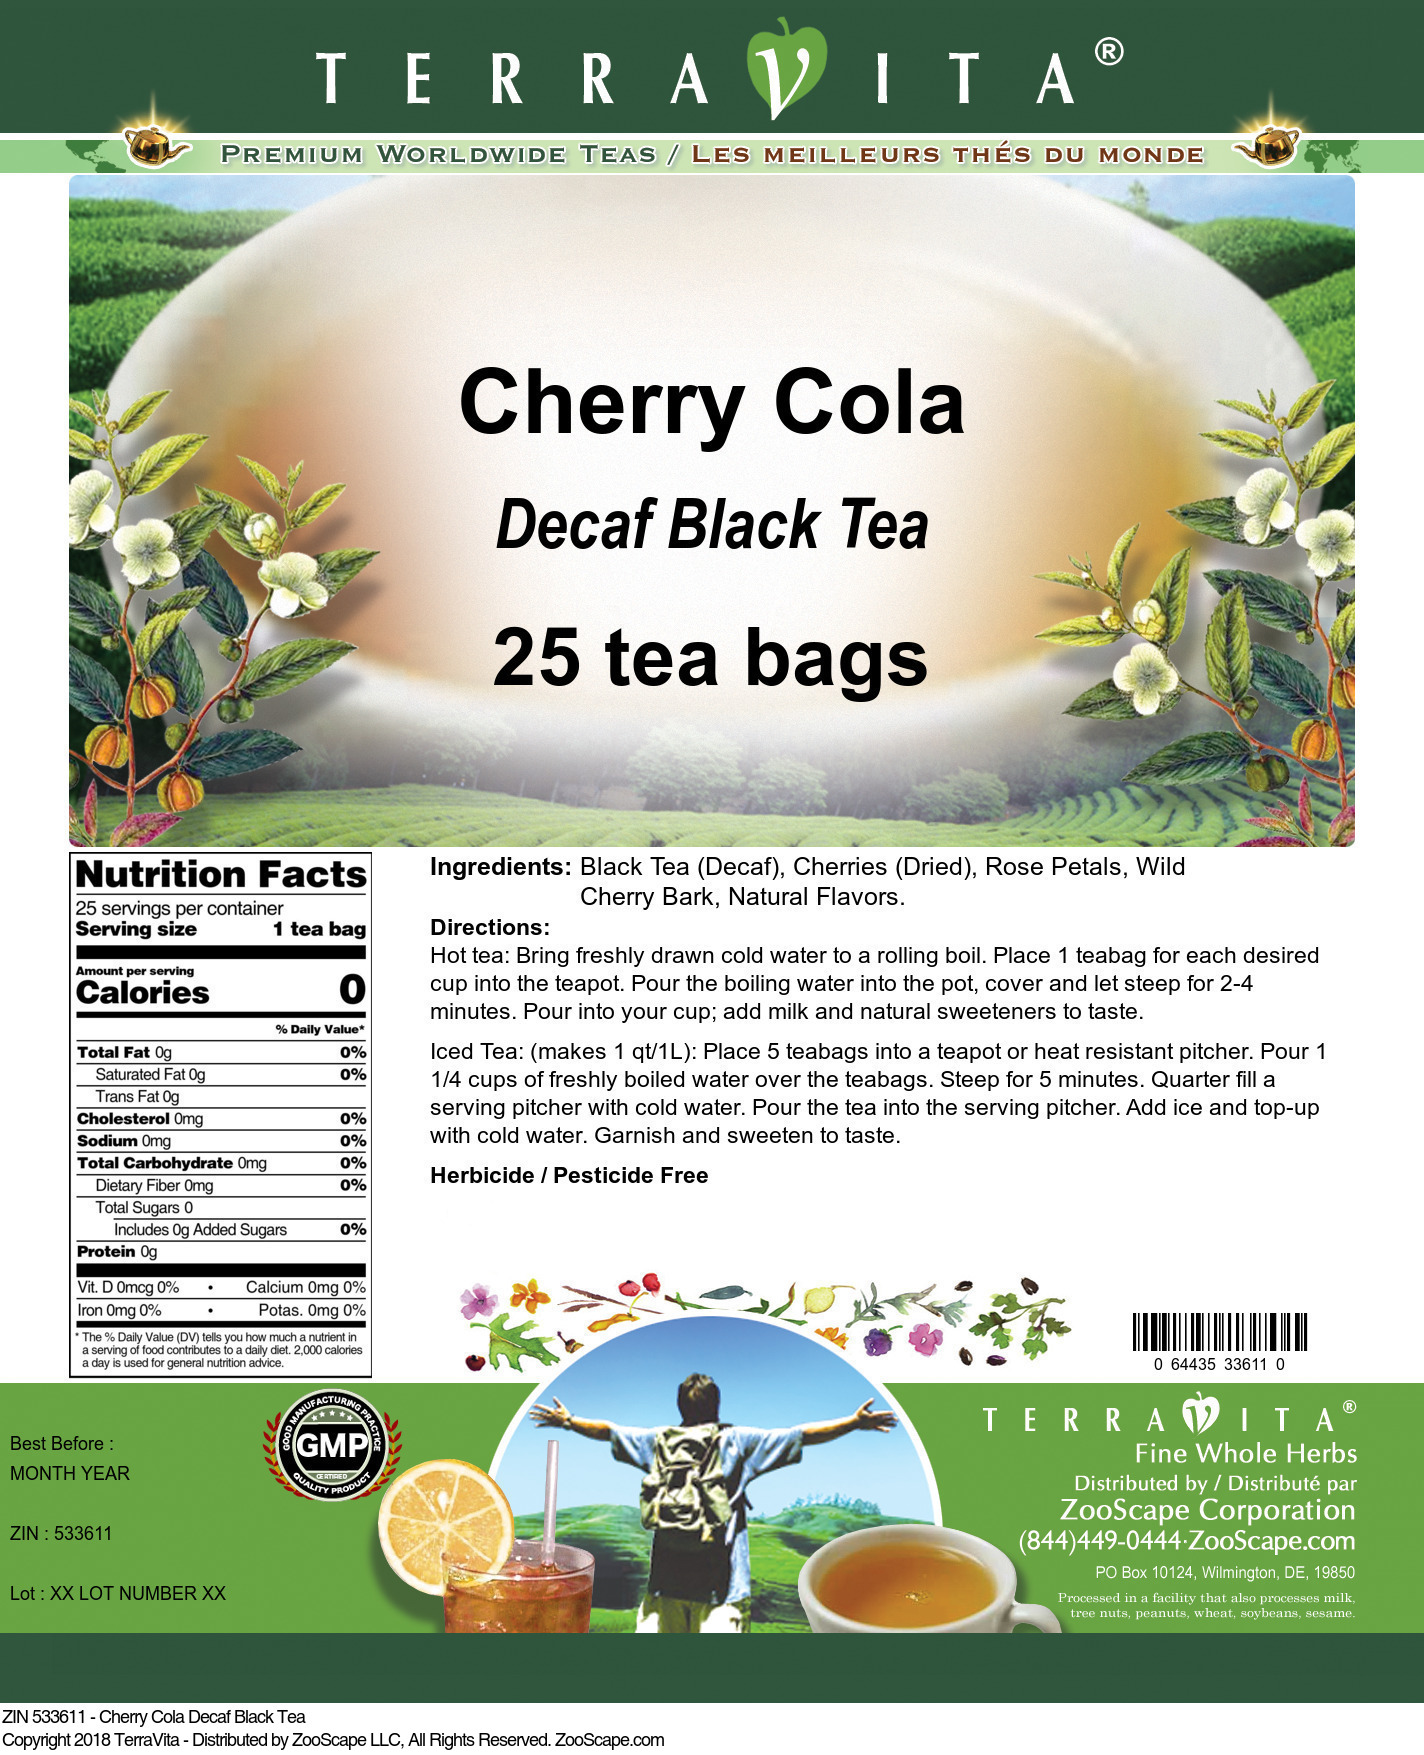 Cherry Cola Decaf Black Tea